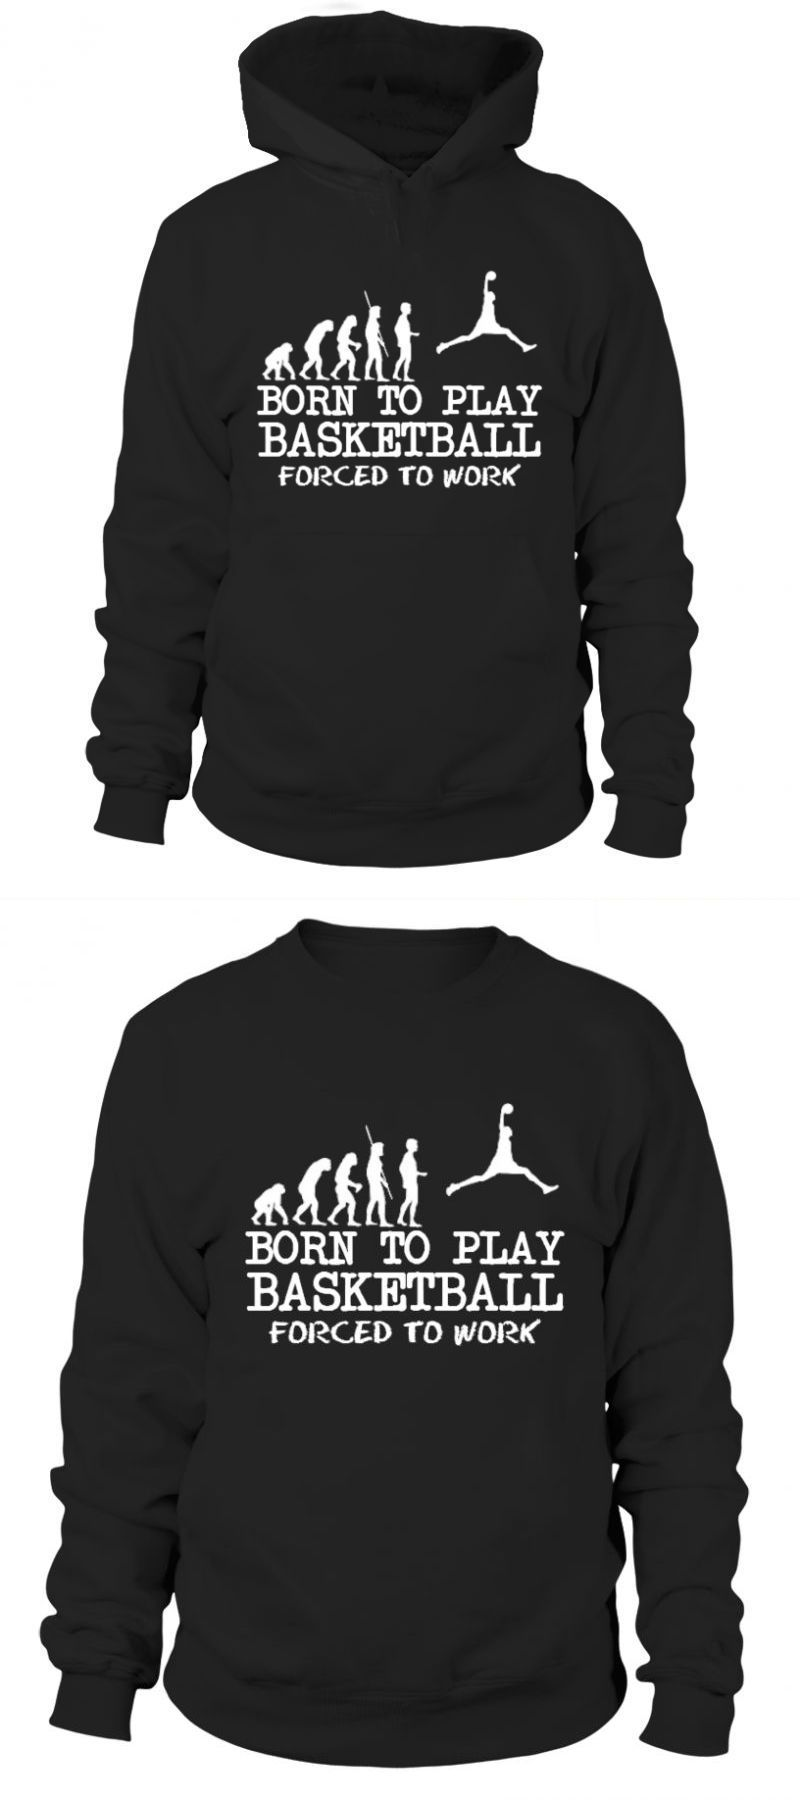 cheap for discount 36760 5b361 Auburn basketball t shirt born to play basketball milwaukee ...